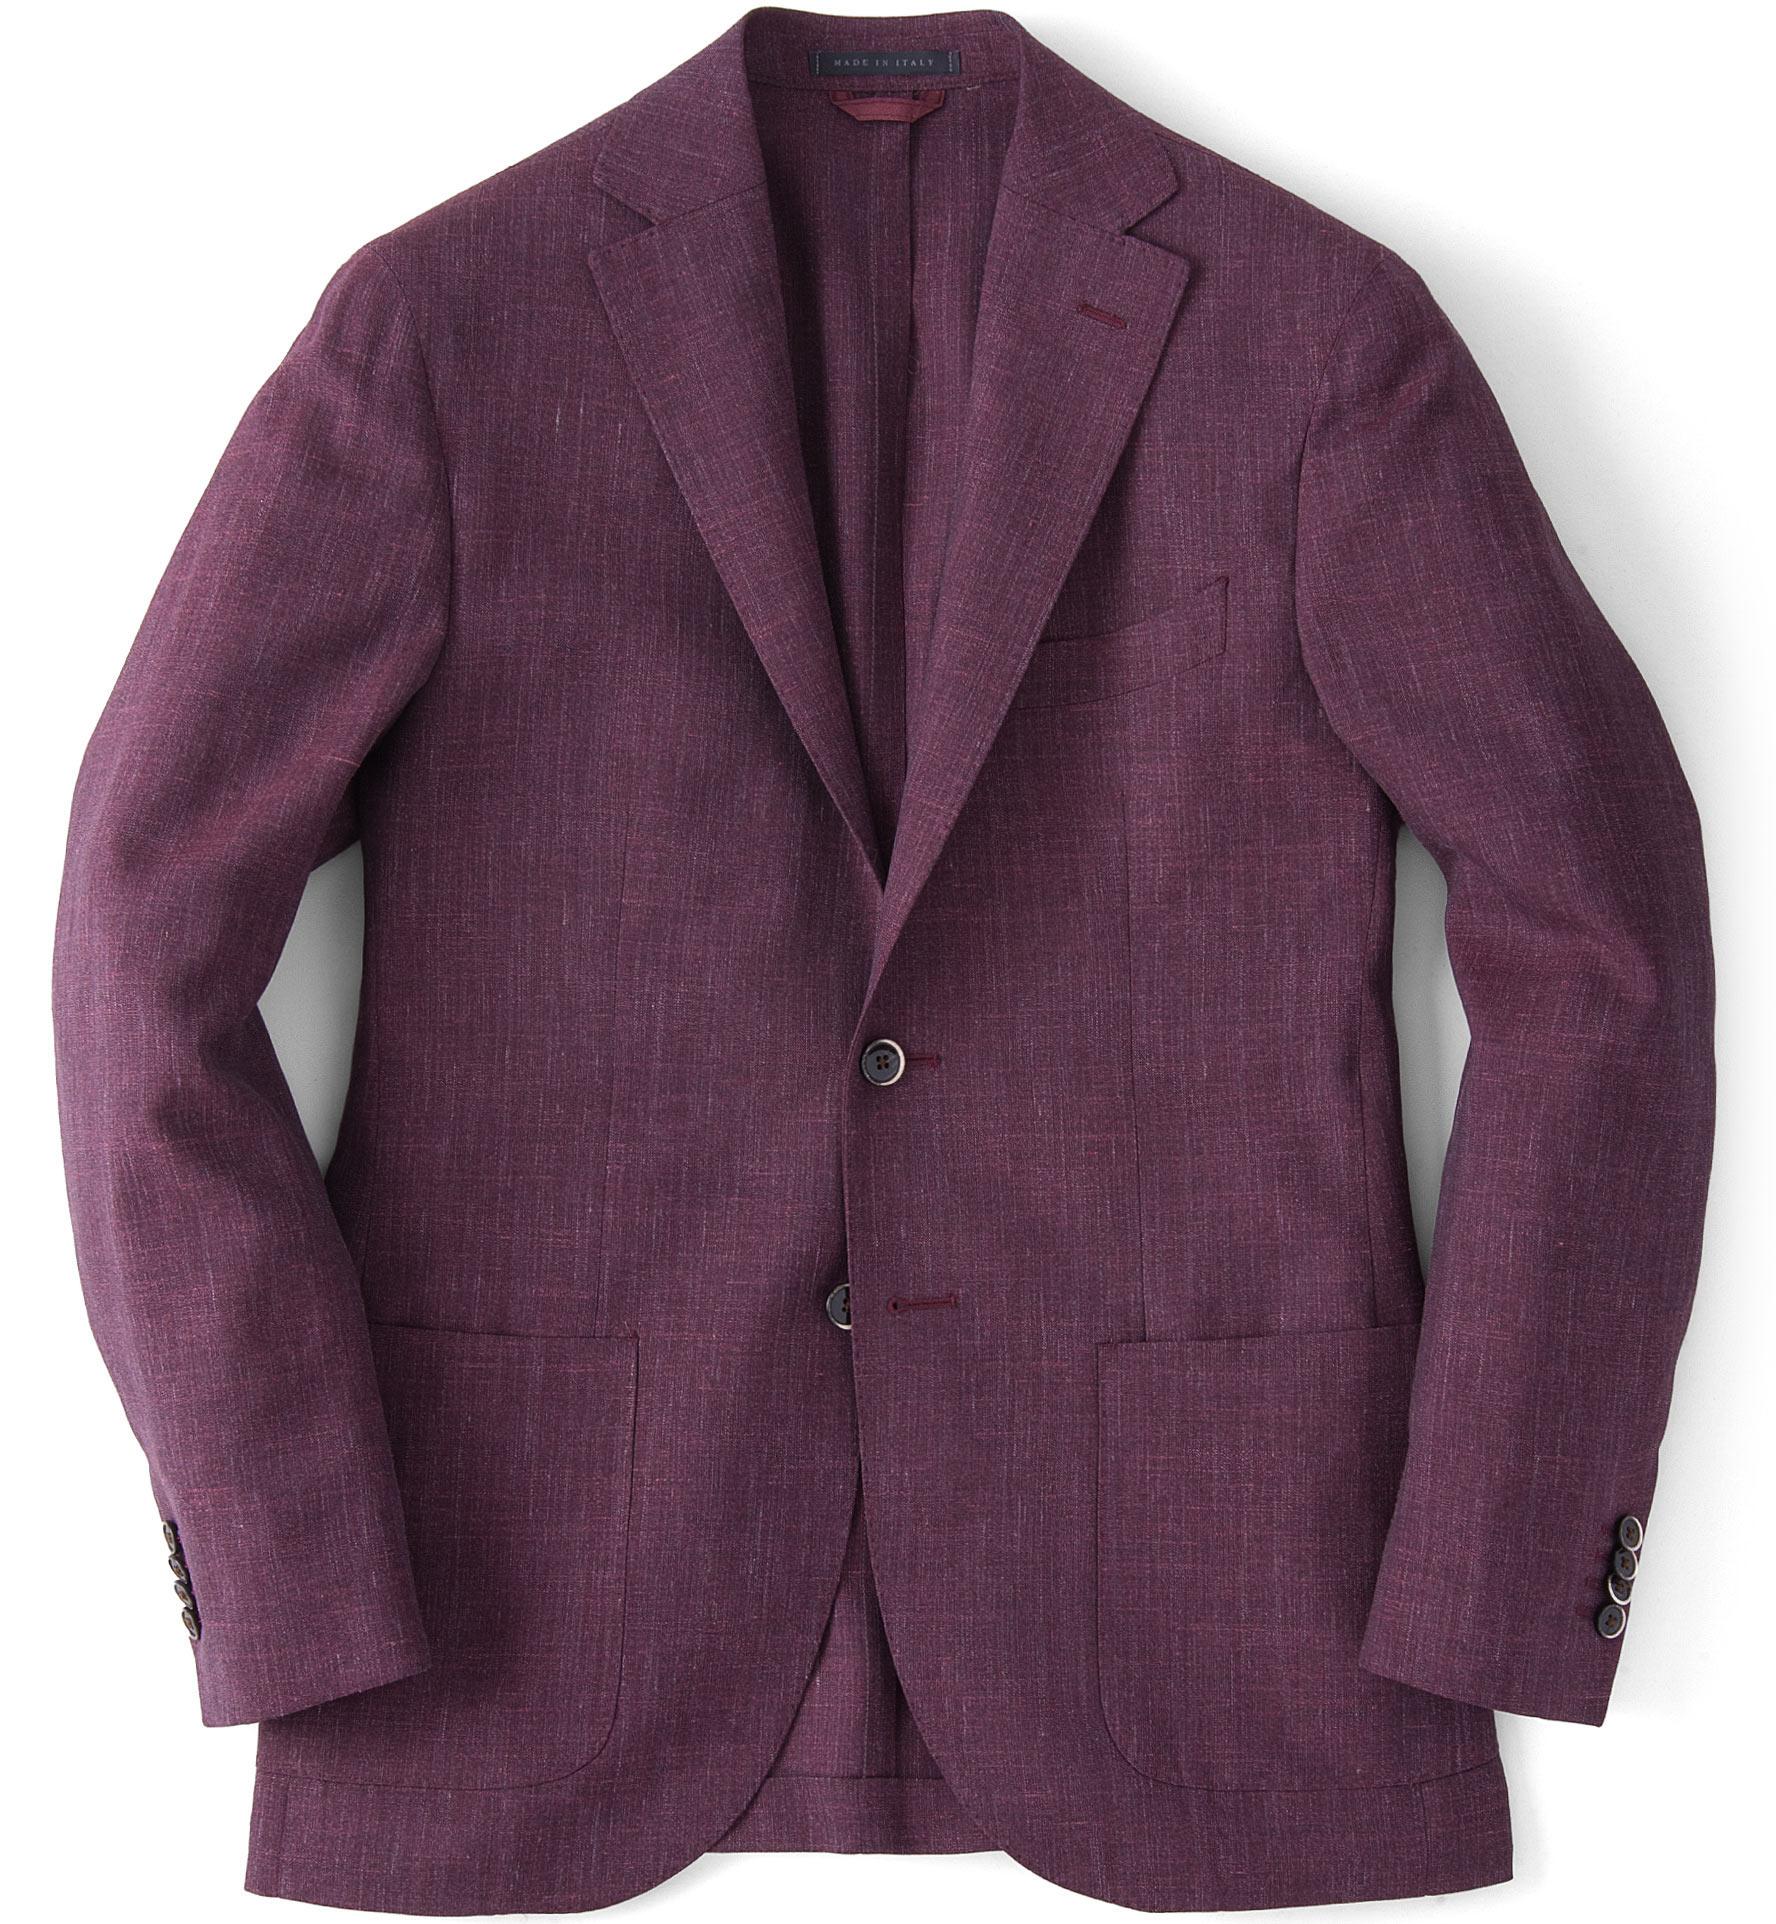 Zoom Image of Burgundy Slub Genova Jacket